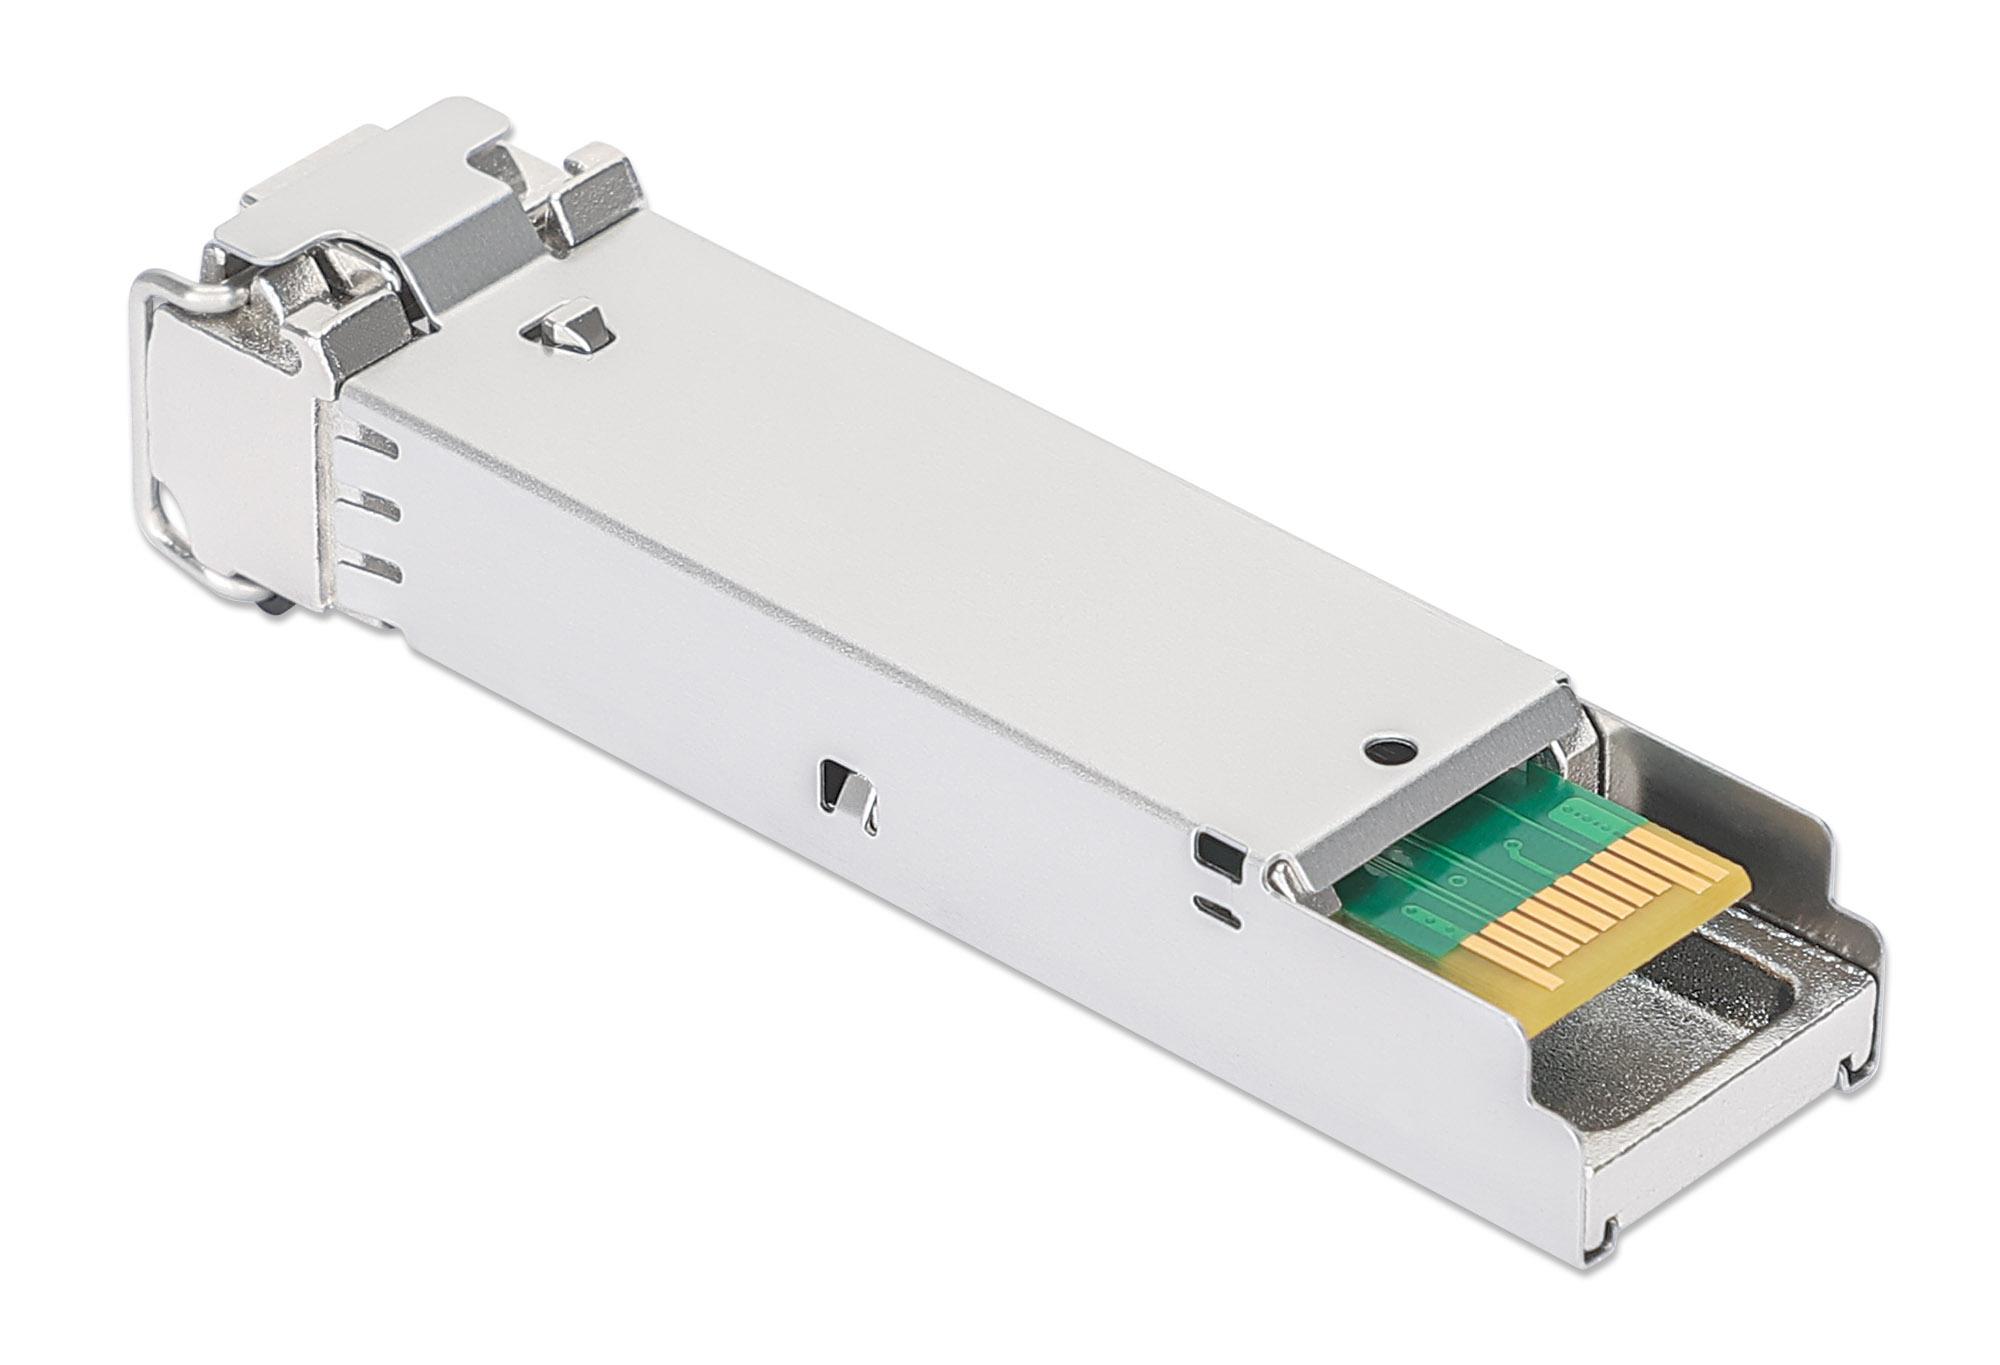 Industrial Gigabit Fiber SFP Optical Transceiver Module